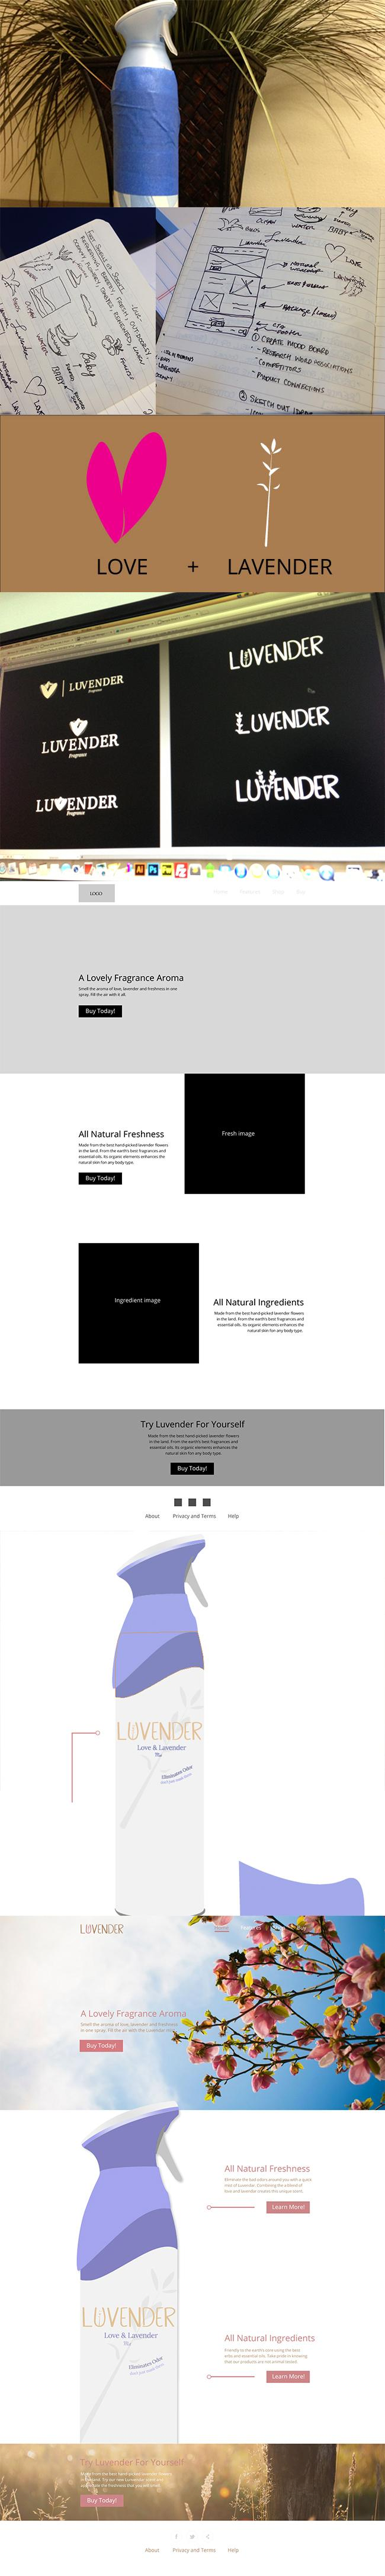 Luvendar - image 2 - student project